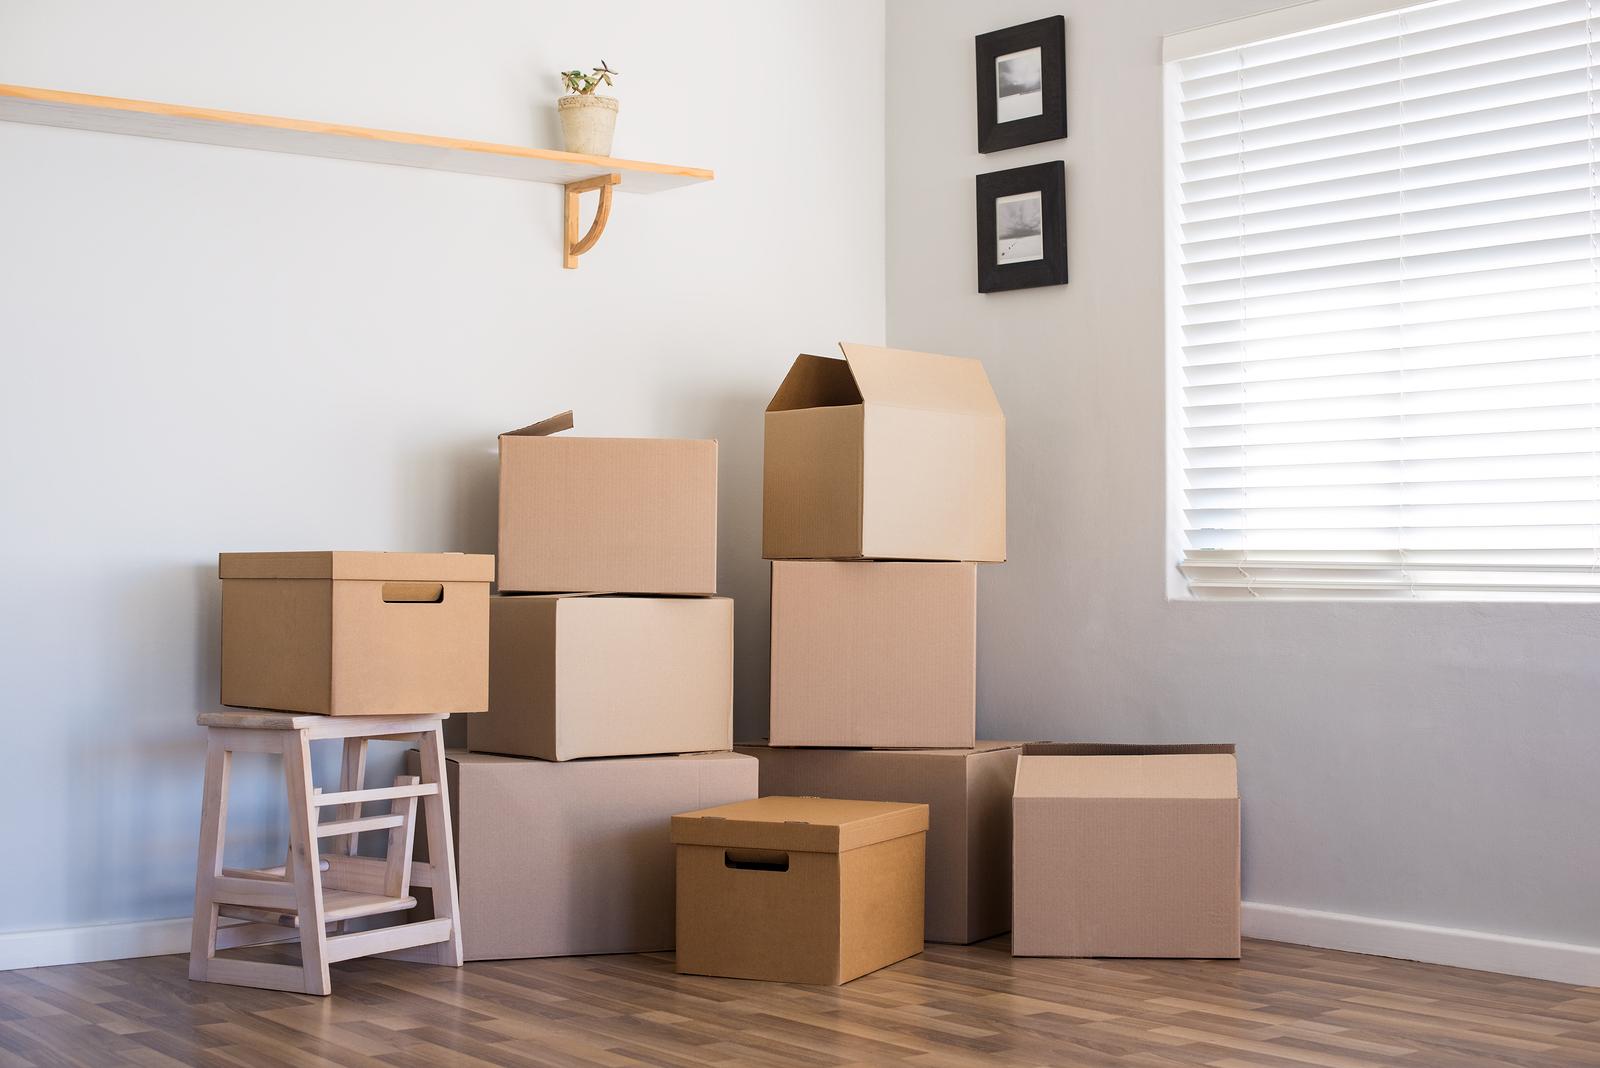 brandon-moving-storage-little-rock-north-maumelle-central-arkansas-bekins-relocating-smaller-place.jpg